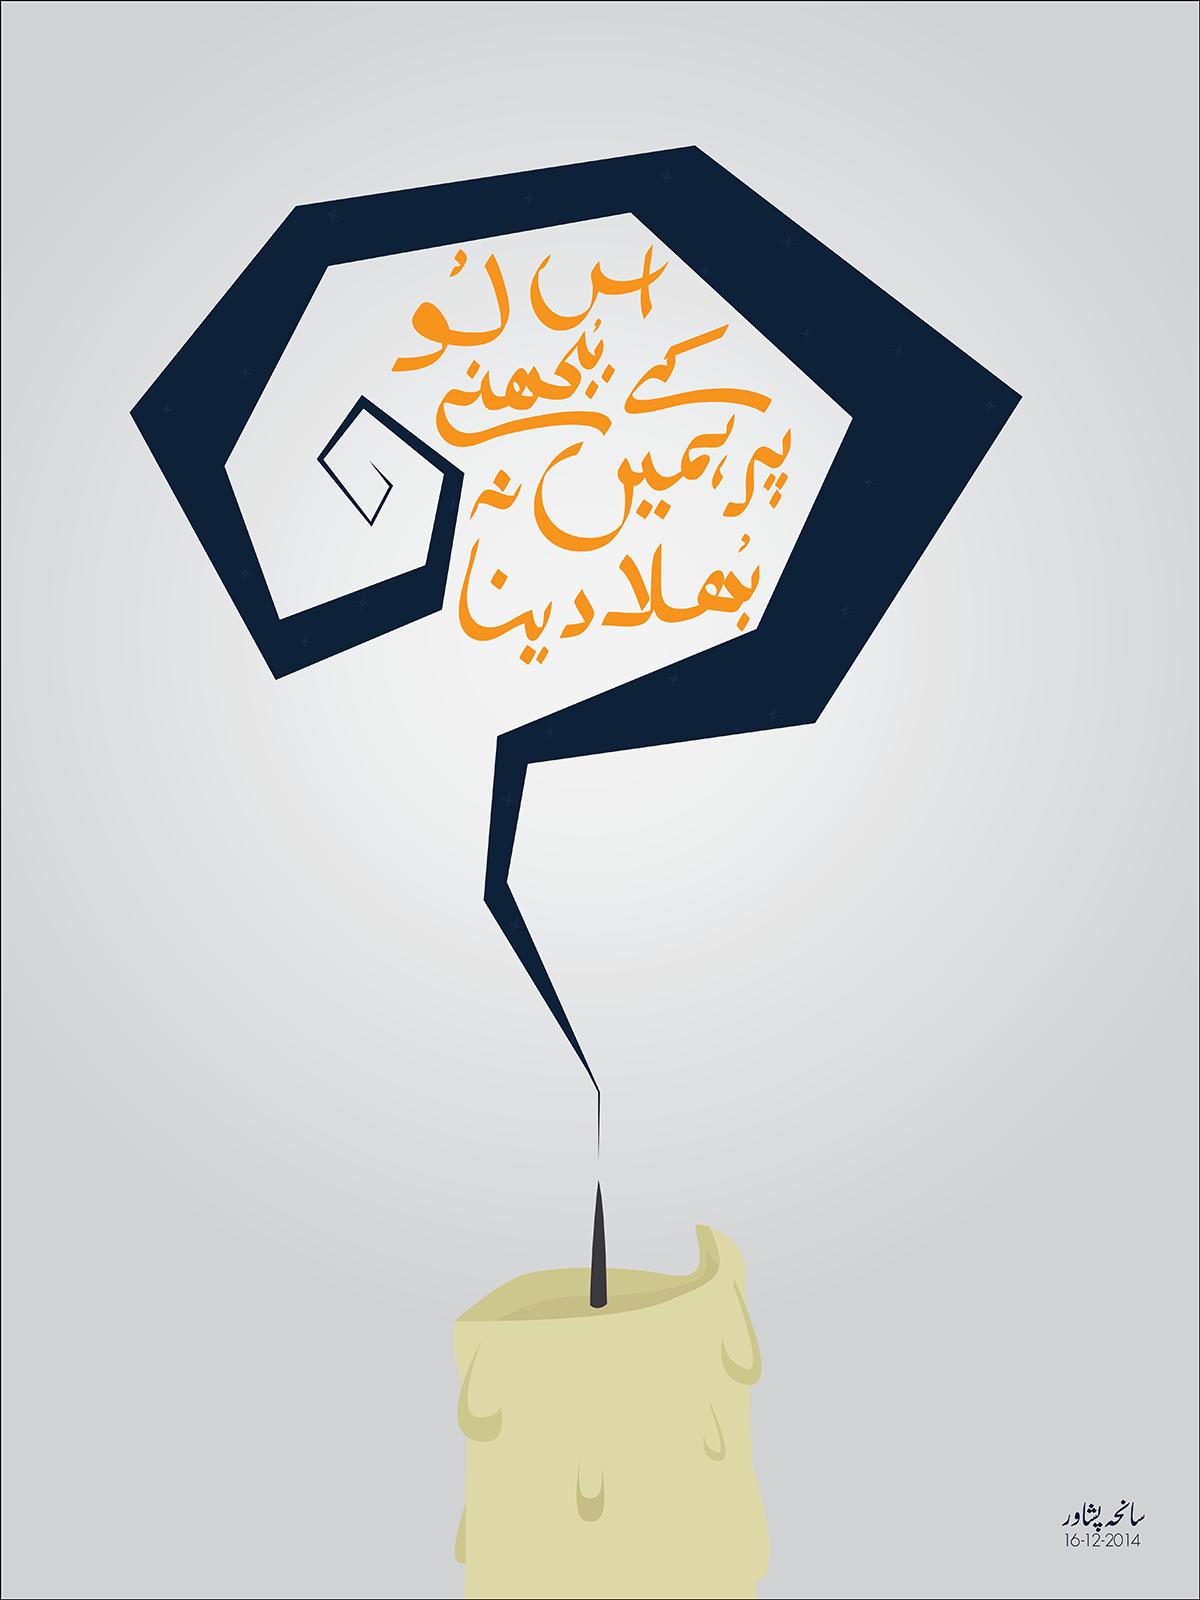 By Osama Shahid